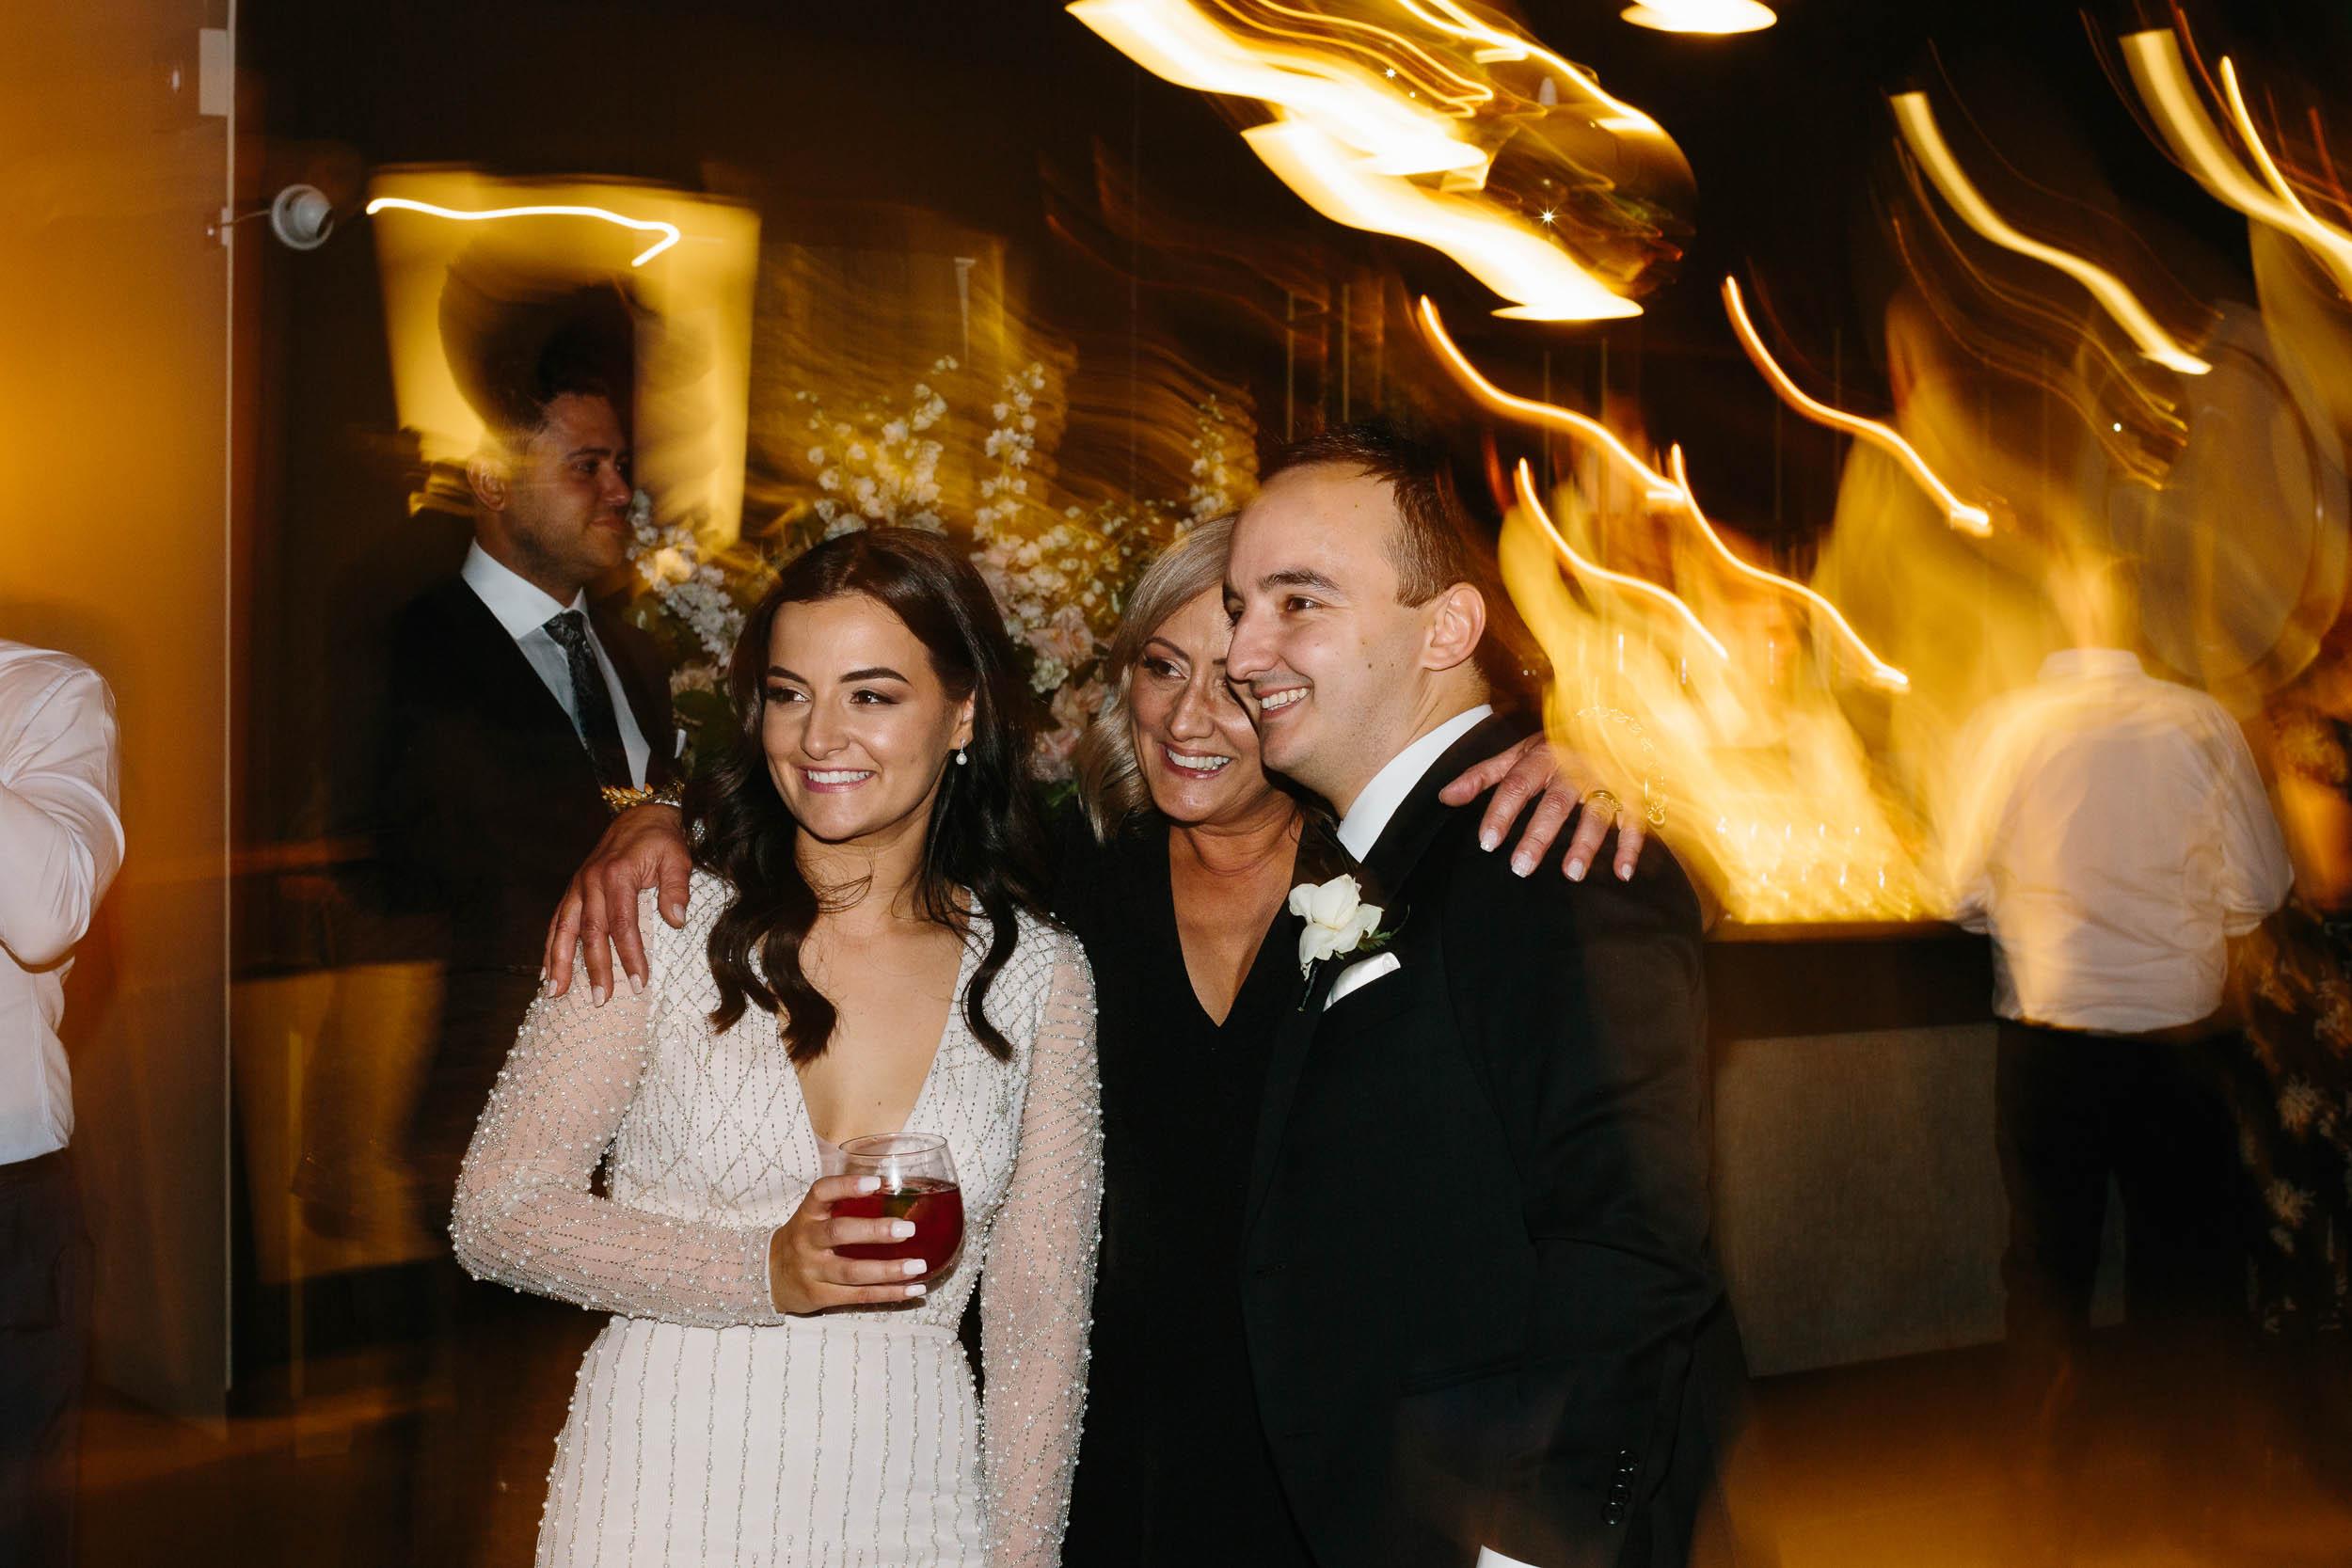 Kas-Richards-Wedding-Photographer-Melbourne-City-Wedding-Alto-Event-Space-Jane-Hill-Bridal-Gown-76.jpg